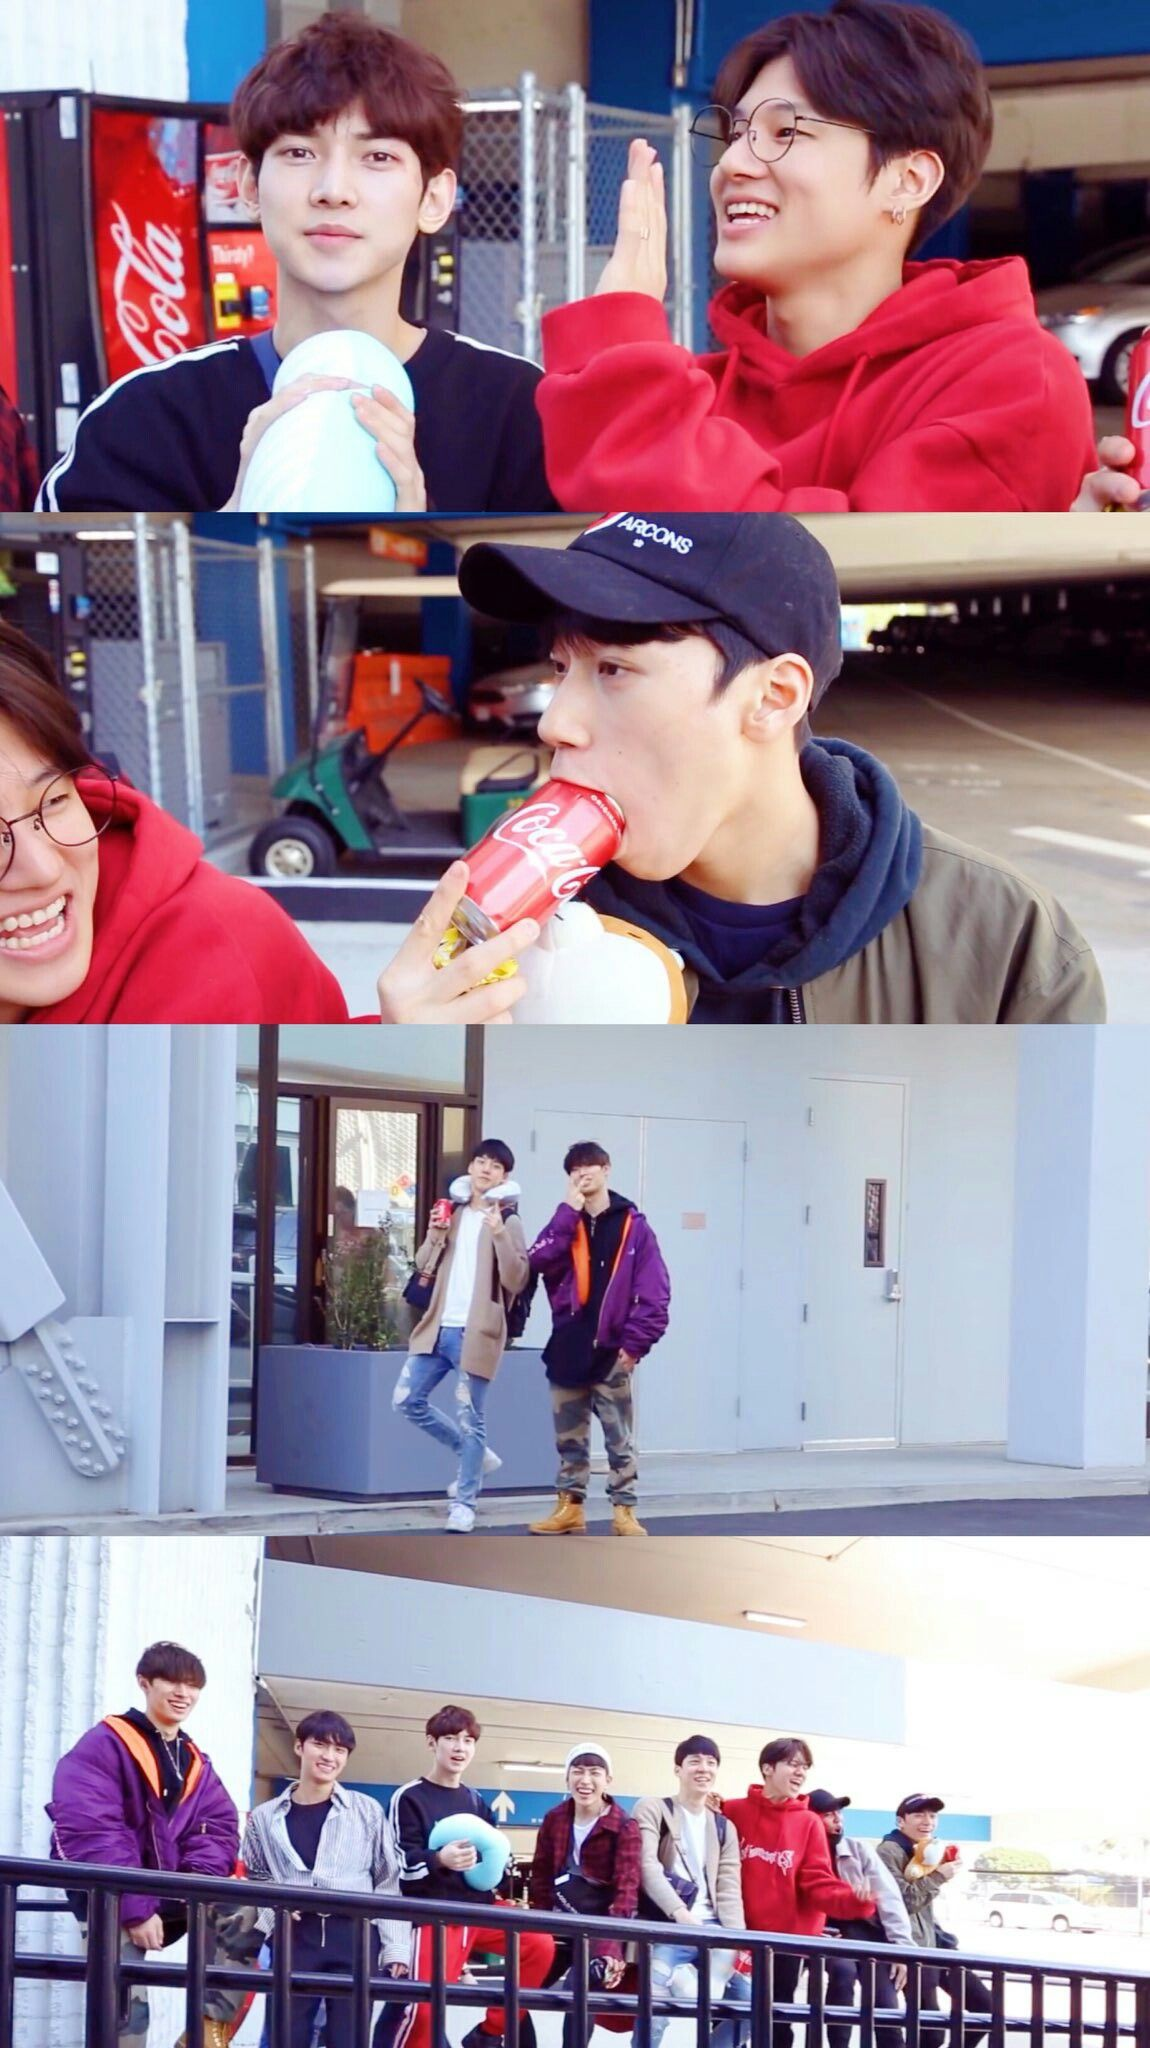 Peep Shiber While San Is Cronchin On His Coke